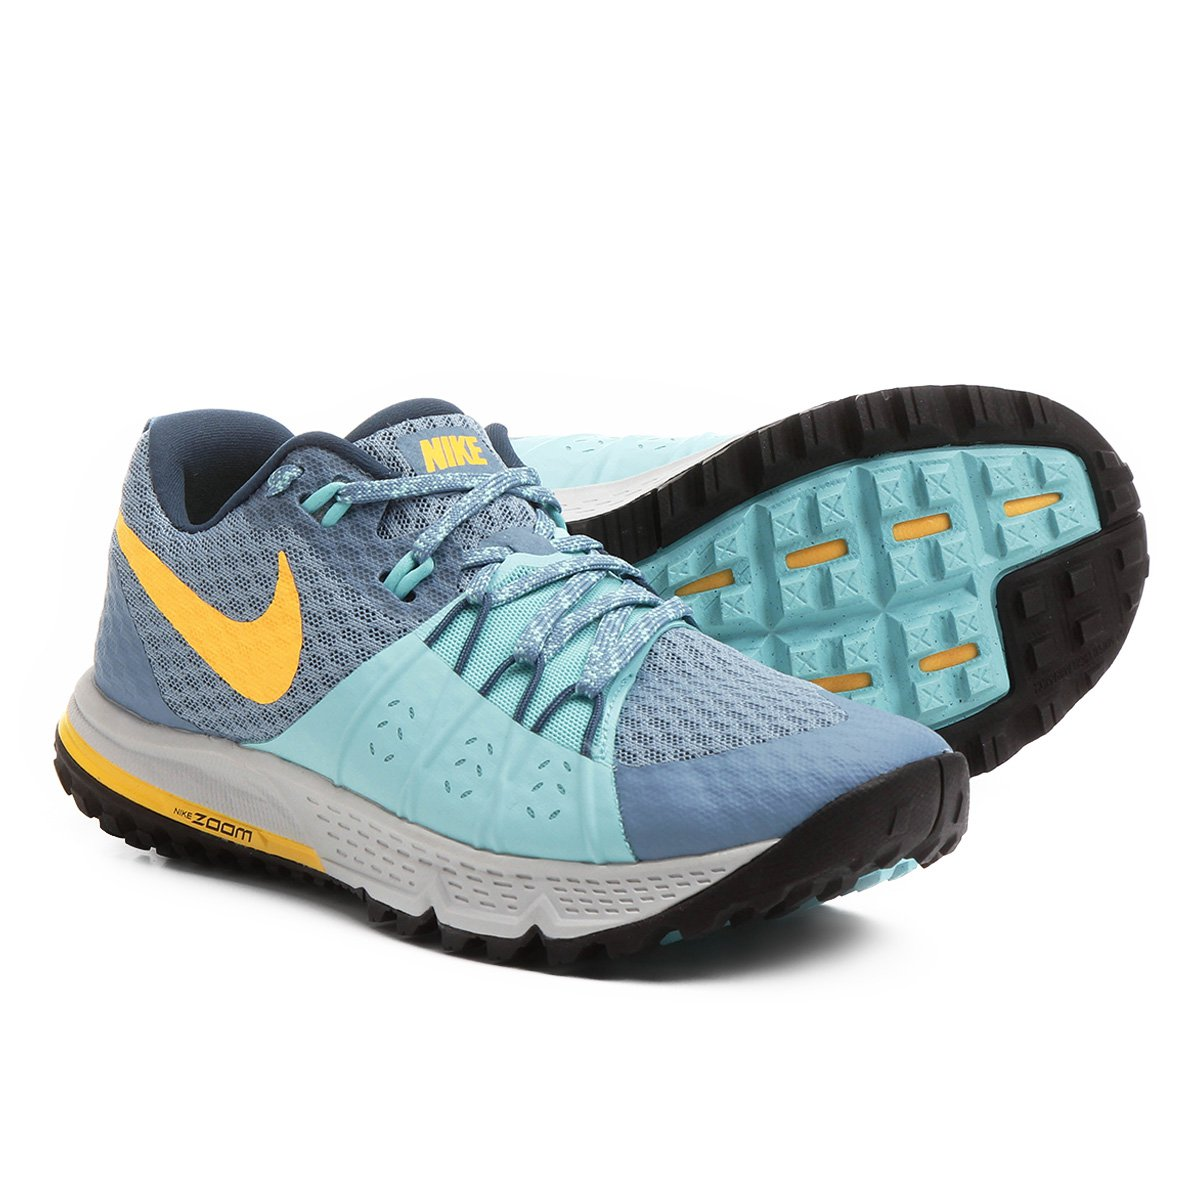 1df51b6640726 Tênis Nike Air Zoom Wildhorse 4 Feminino - Compre Agora